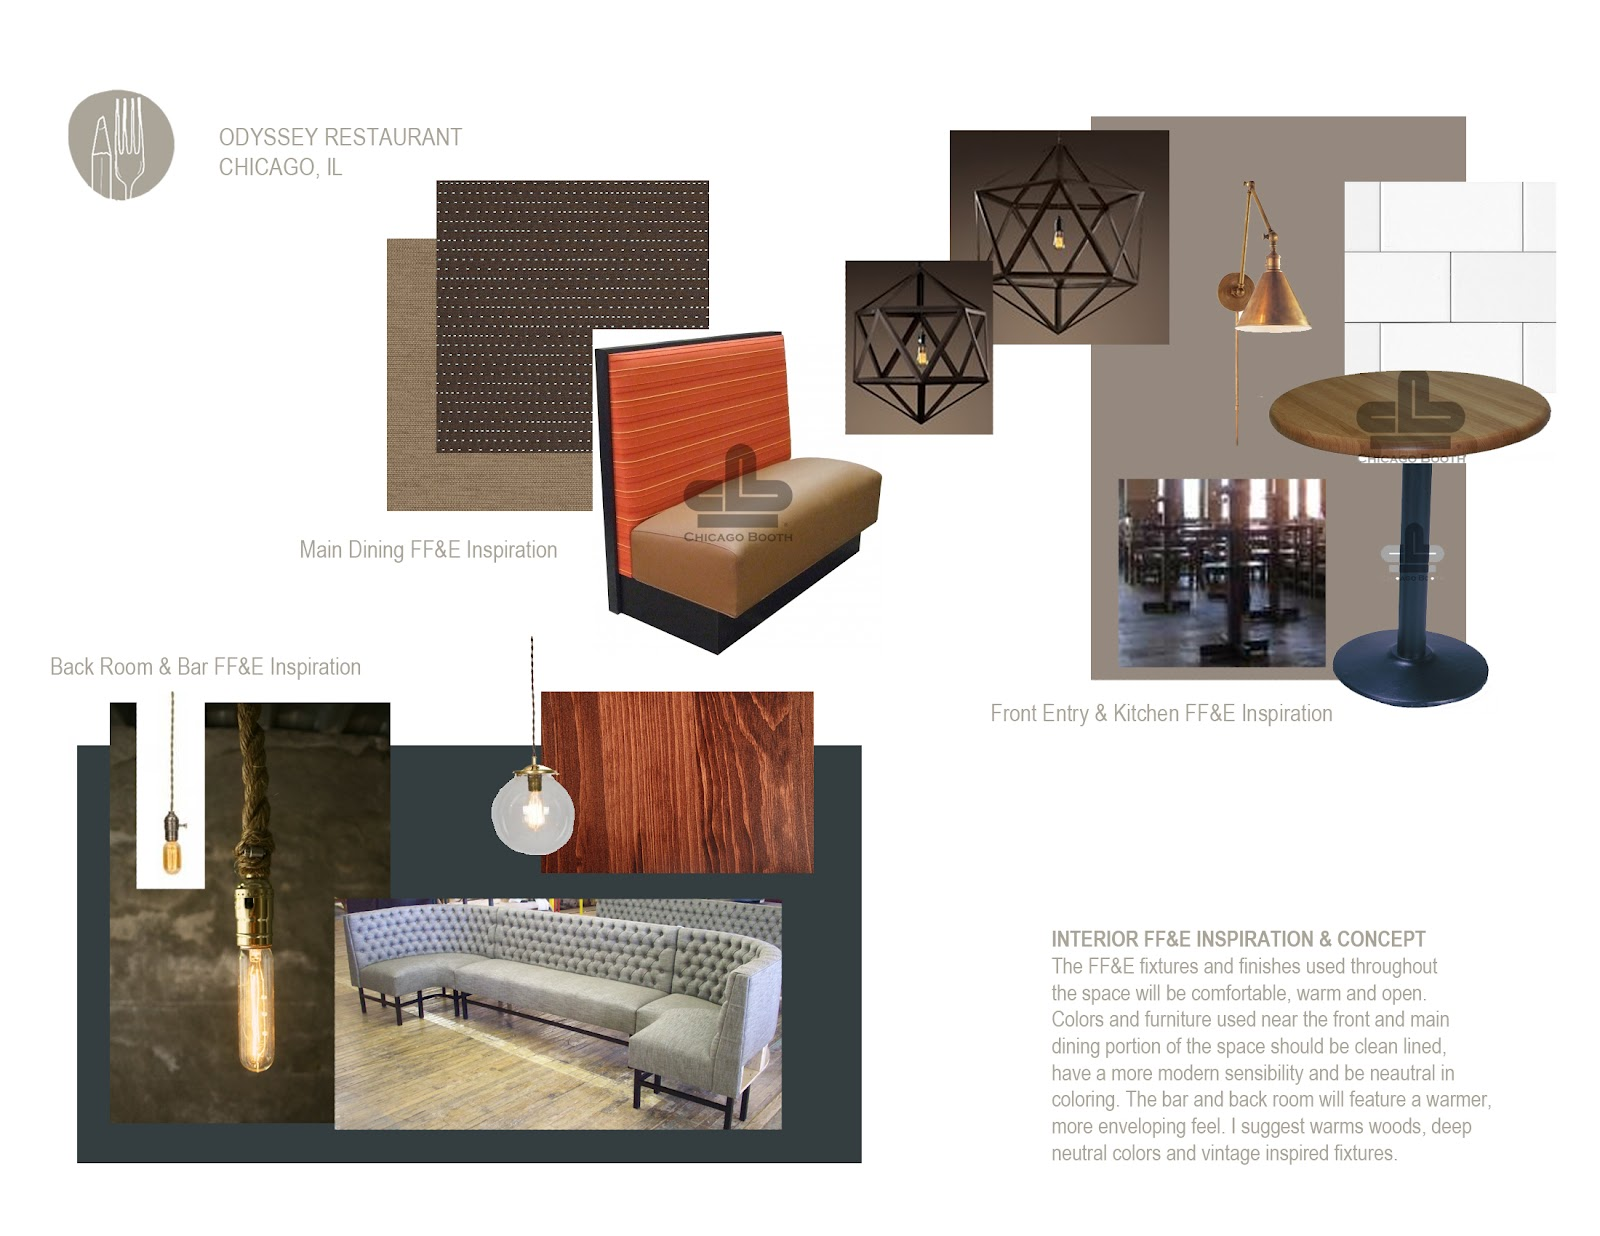 Kaper design restaurant hospitality design inspiration for Inspiration concept interior design llc